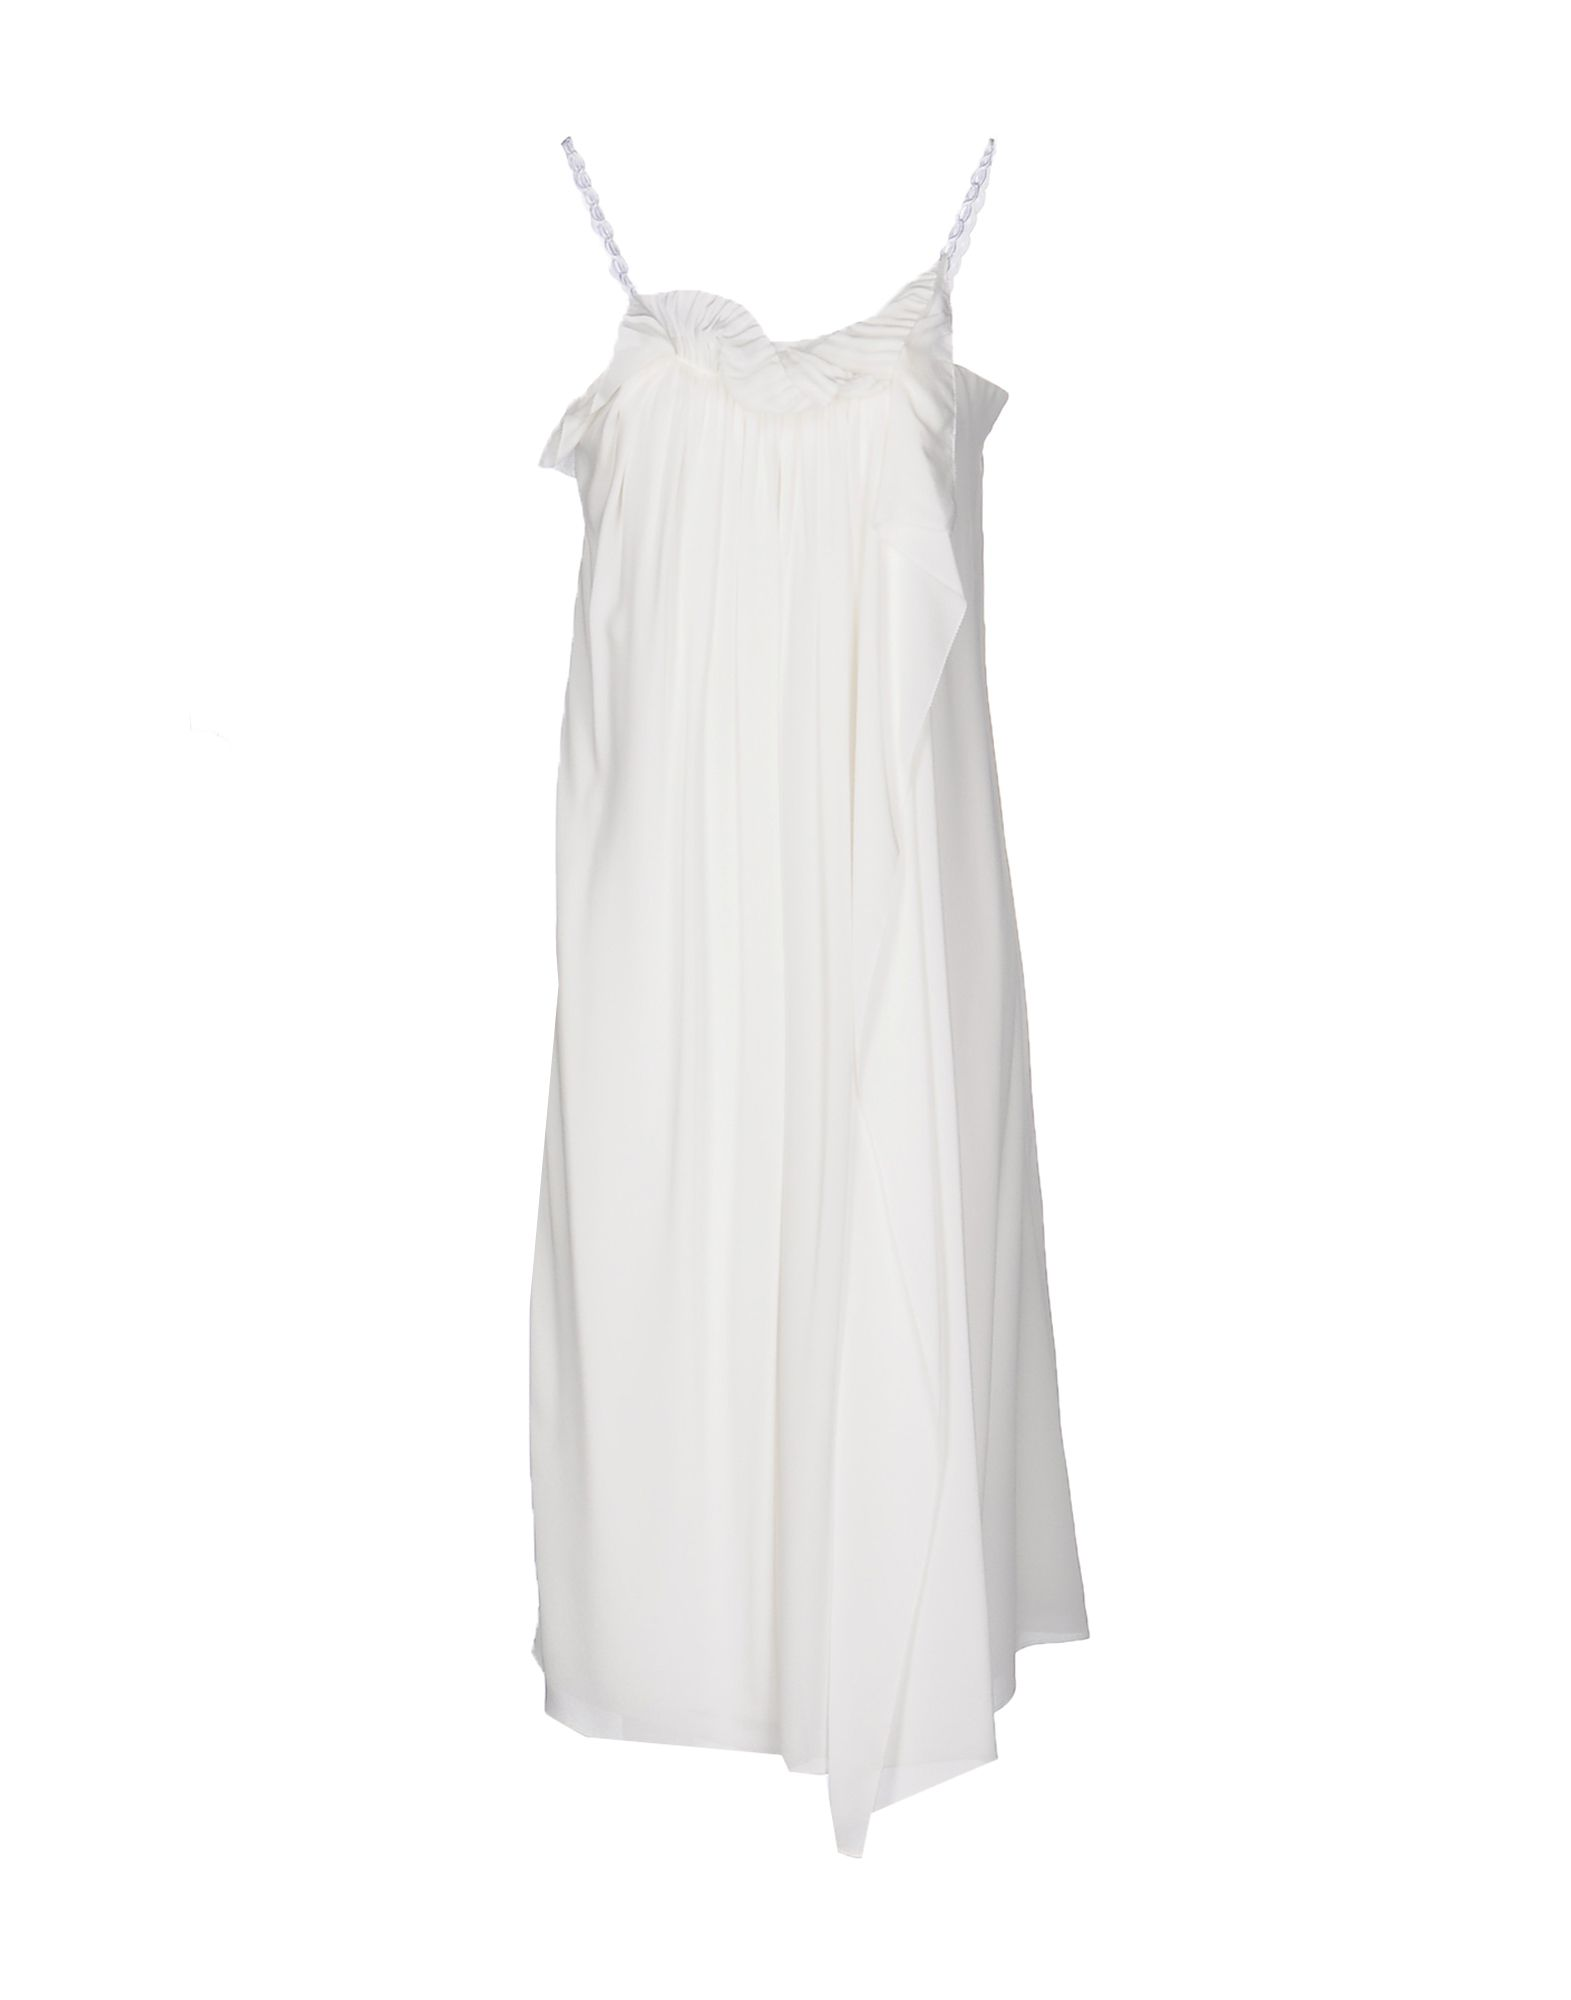 3.1 PHILLIP LIM Платье длиной 3/4 3 1 phillip lim футболка